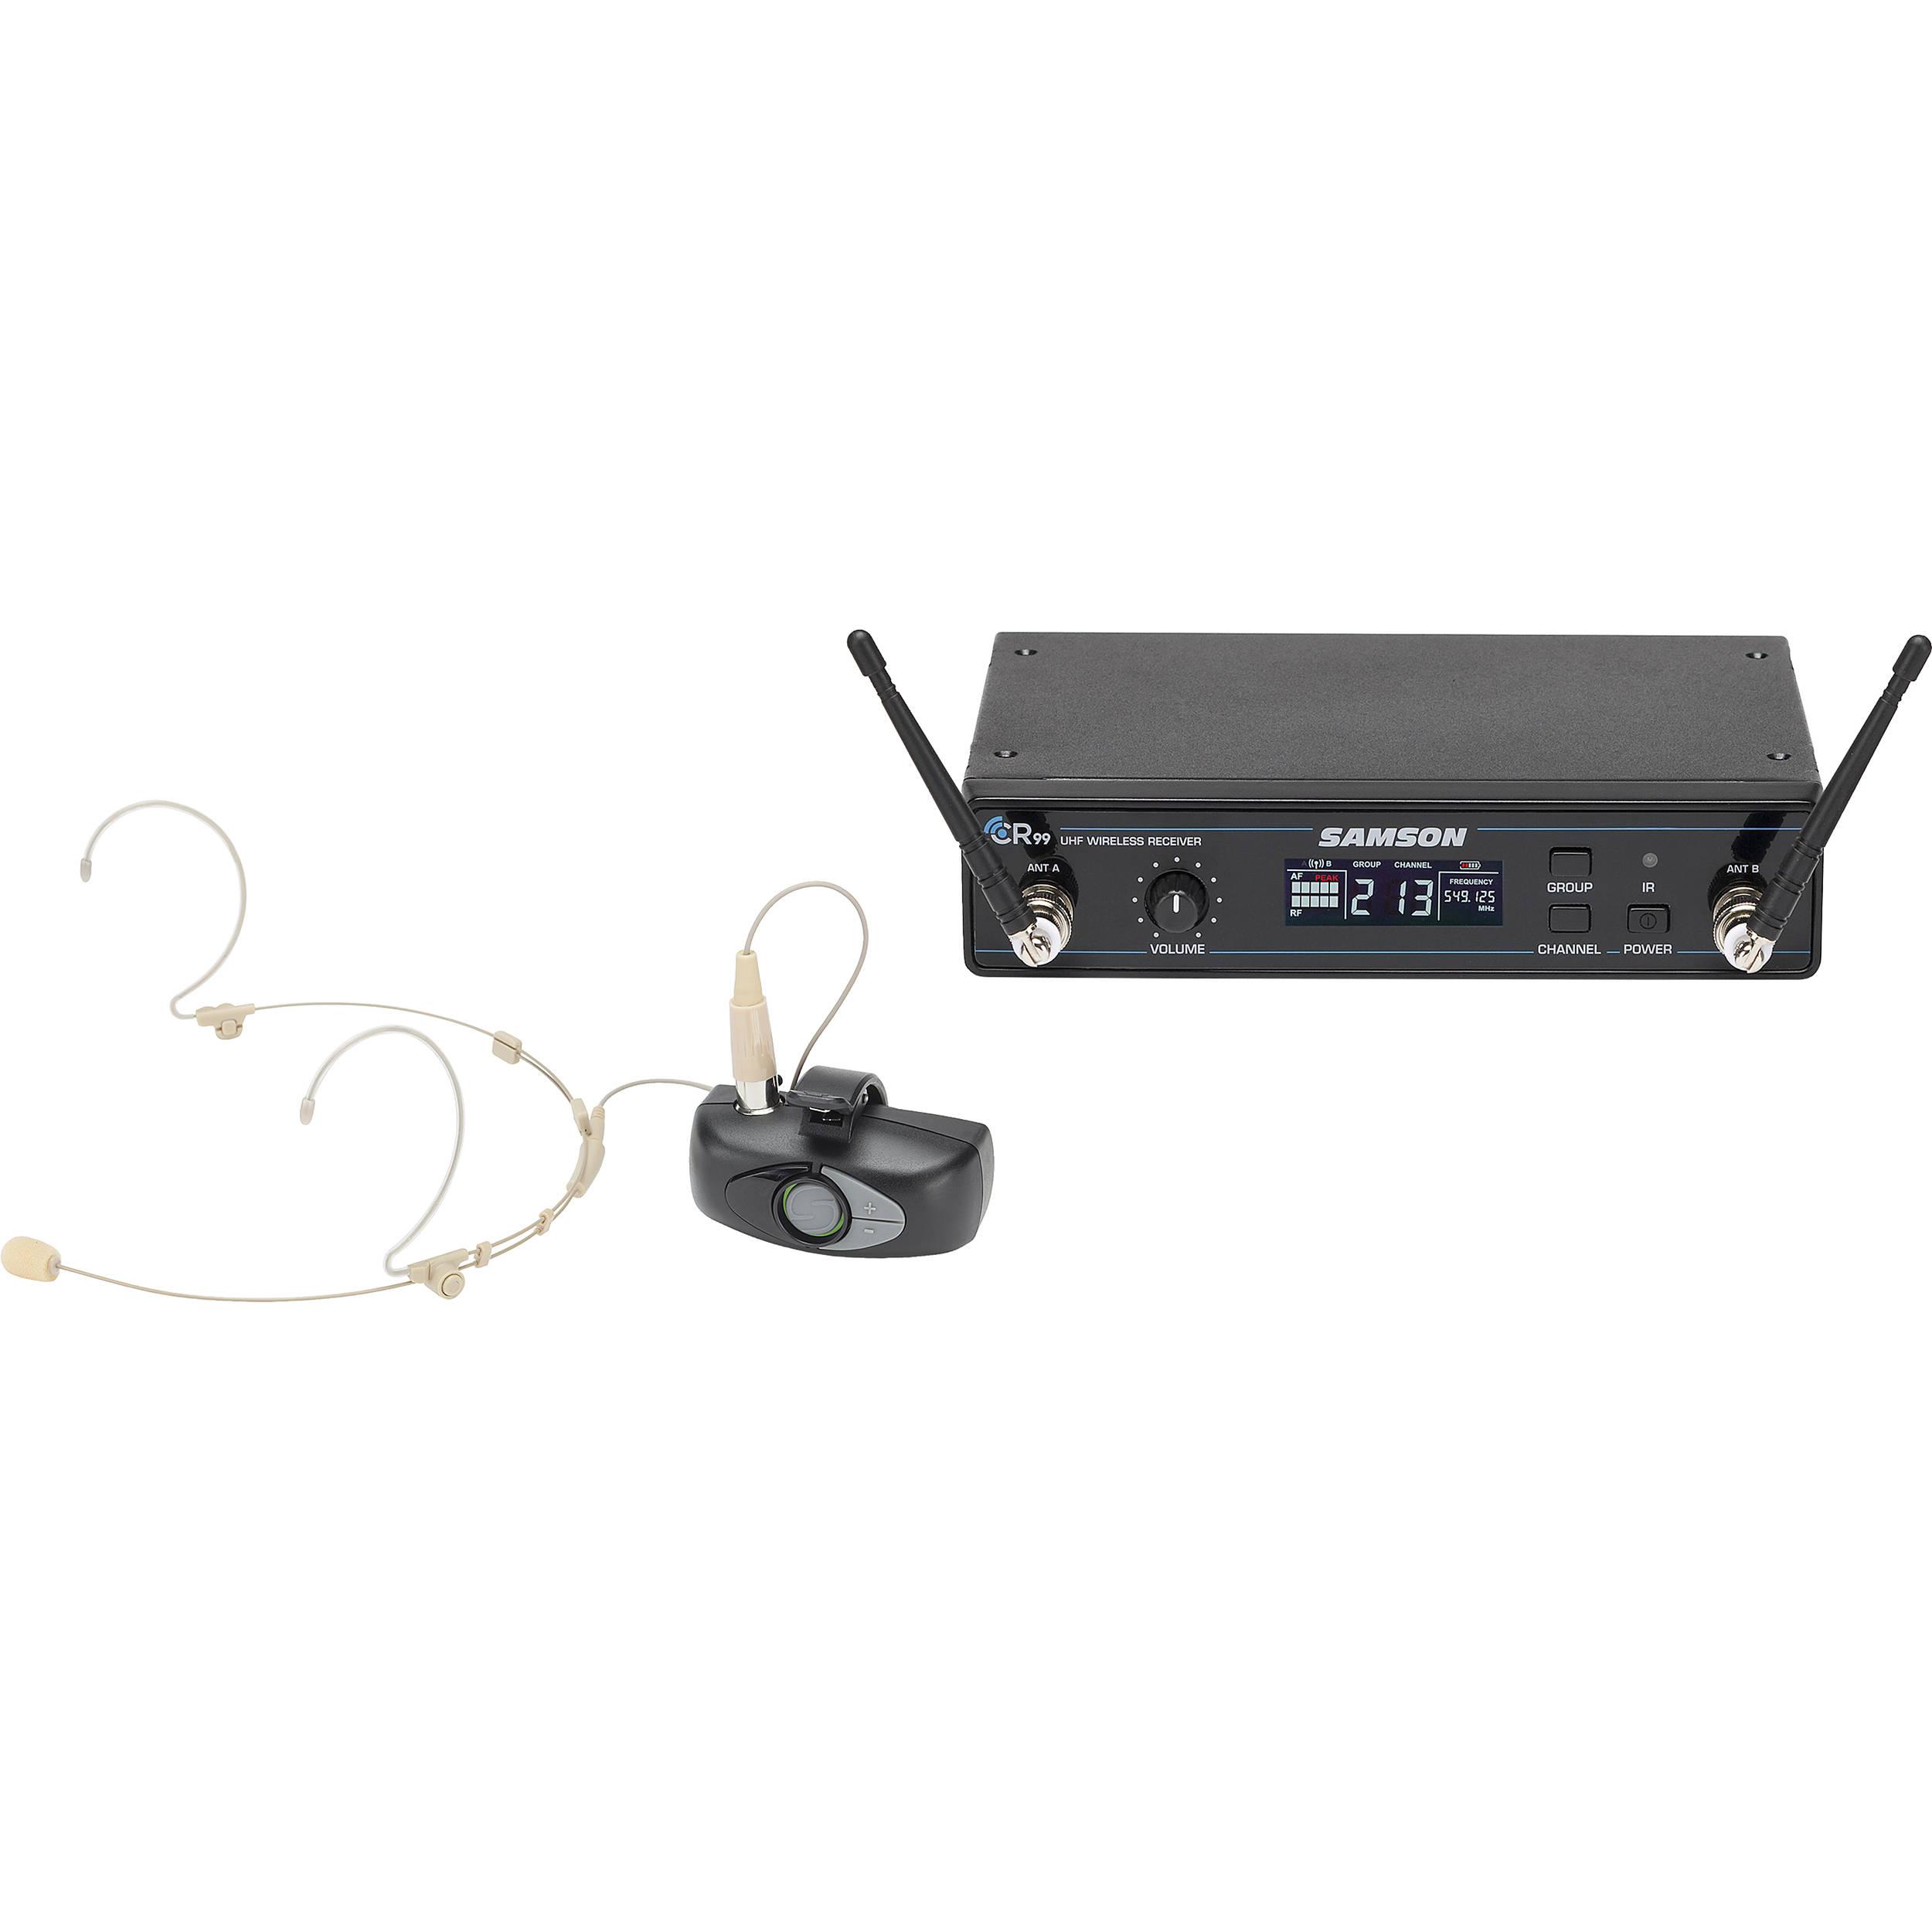 COBRA MR F55-D Two-Way Radio,VHF,LCD,Amber,98 Channels